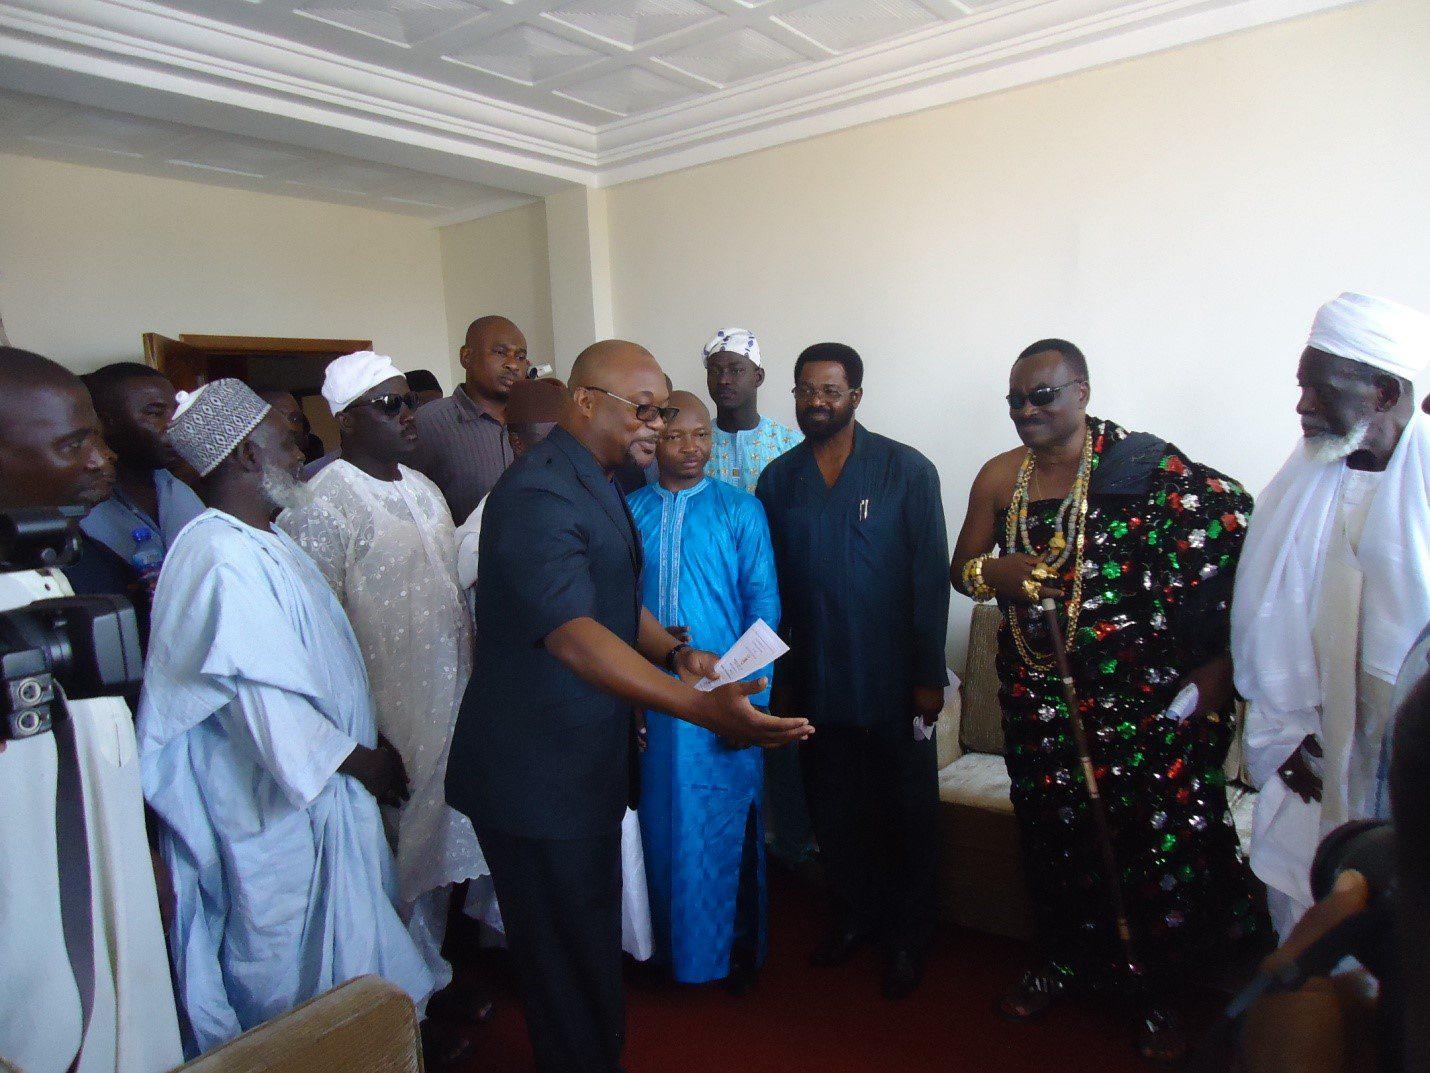 Mr Gideon Aryequaye conducting dignitaries round the new facility.